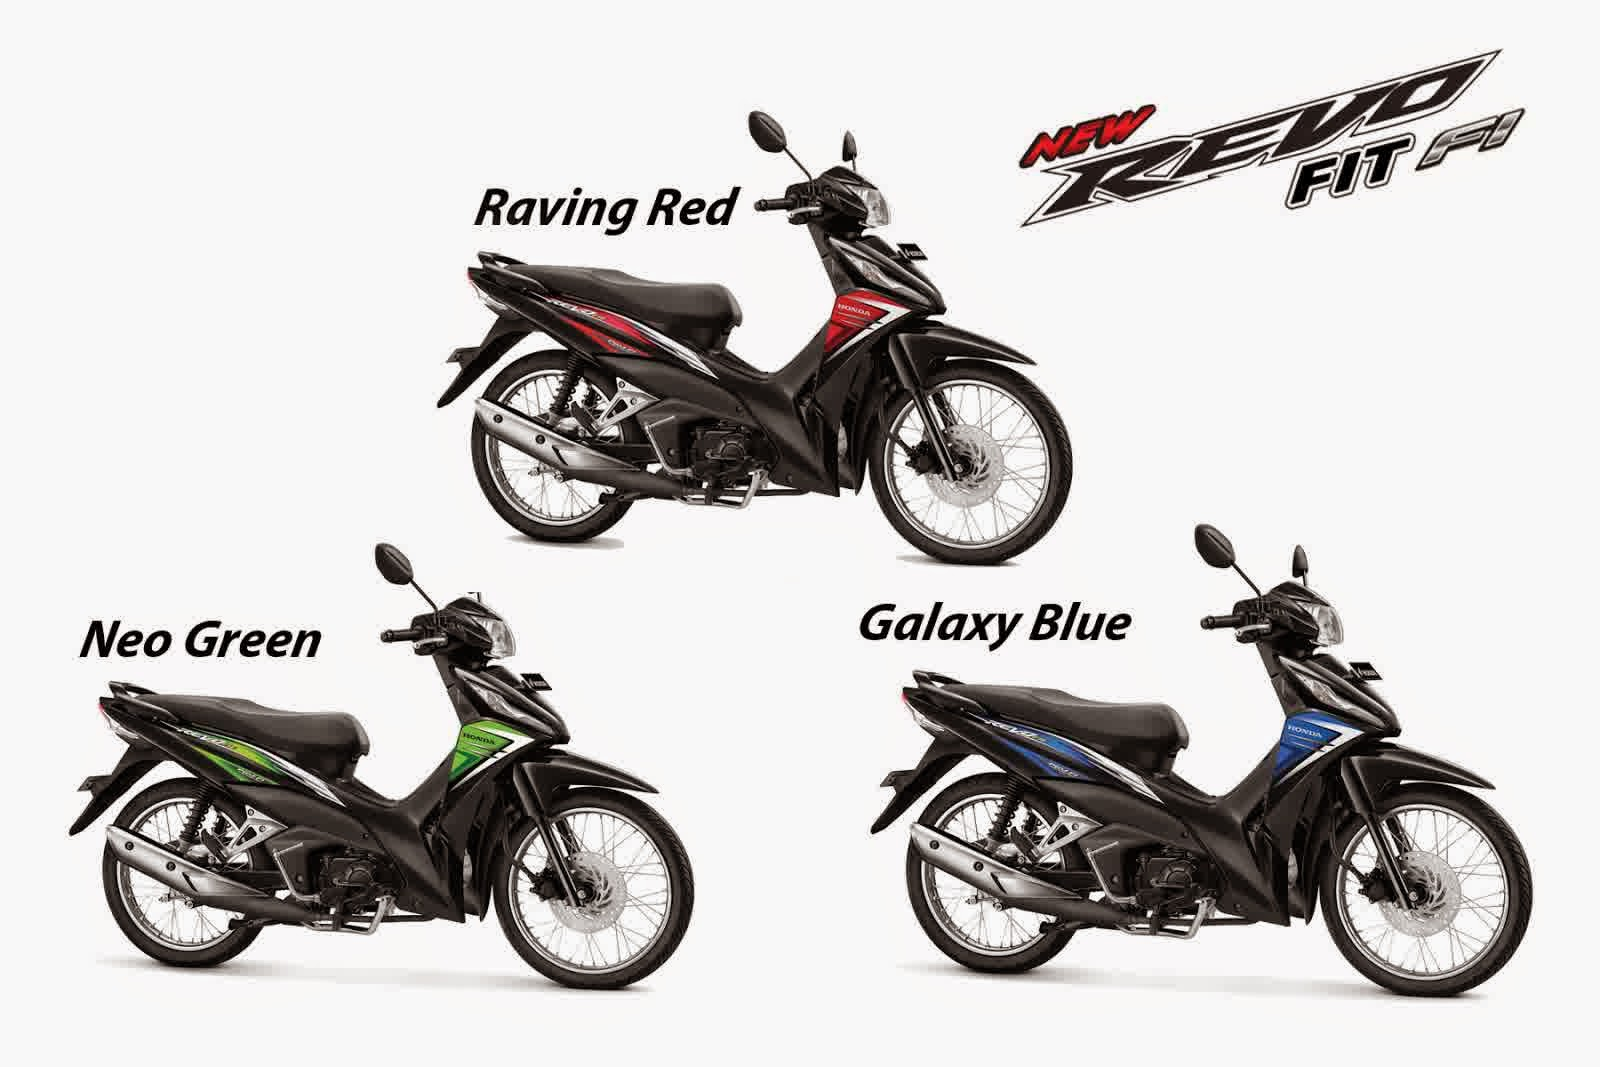 Kredit Motor Honda Dp500rb Cimahi Dan Bandung All New Beat Sporty Esp Cw Dance White Pemalang Revo Fit Dp 800 Ccilan 550 35x Pop